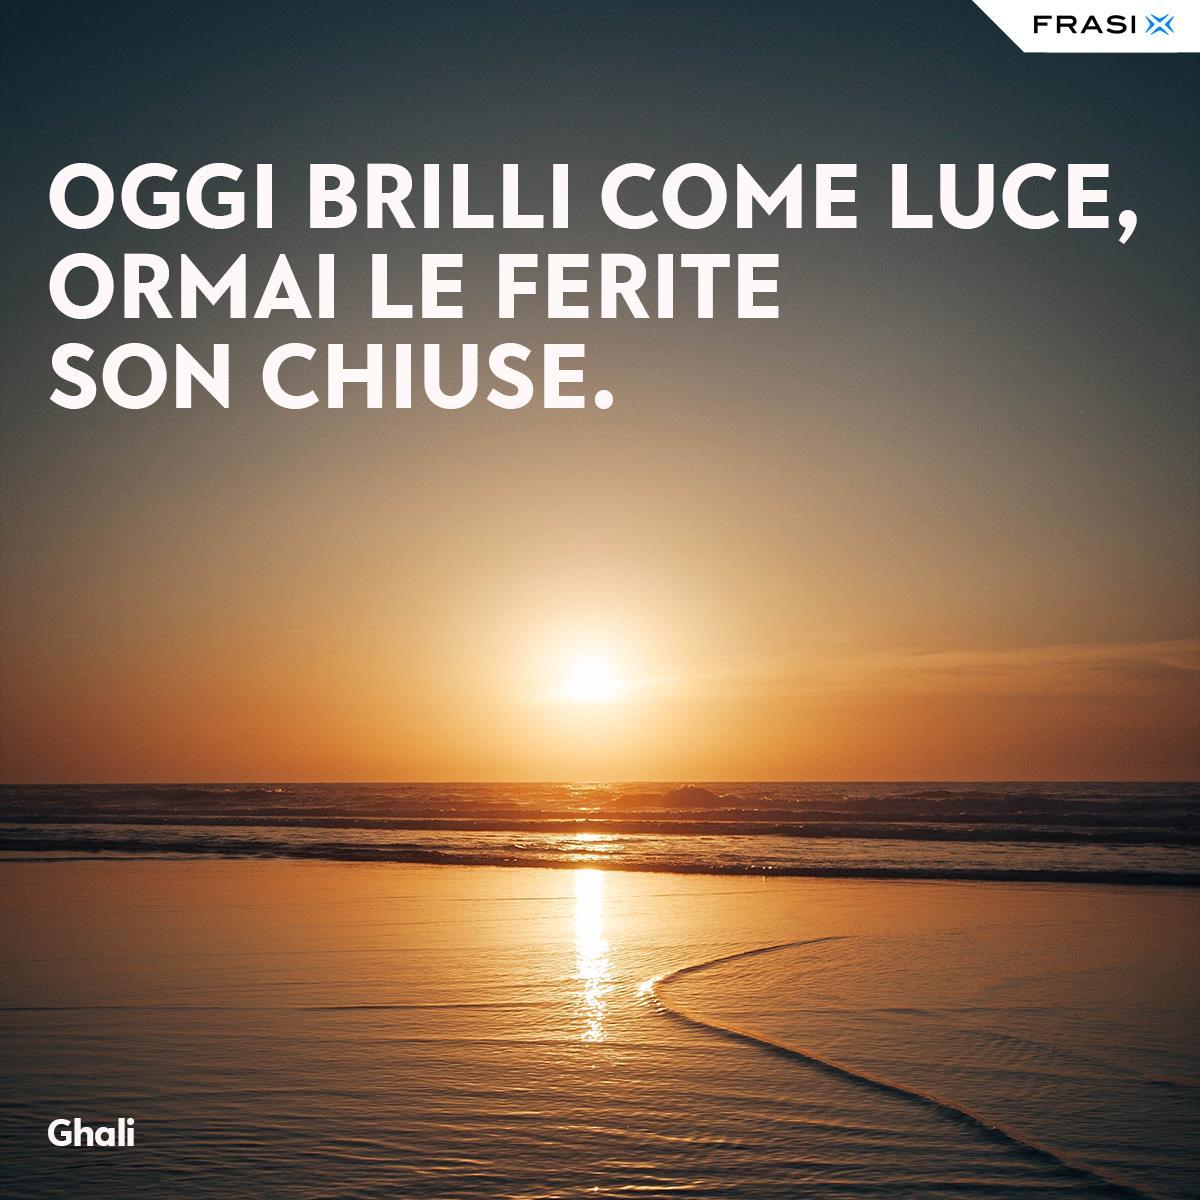 Frasi rap in italiano amore finito Ghali